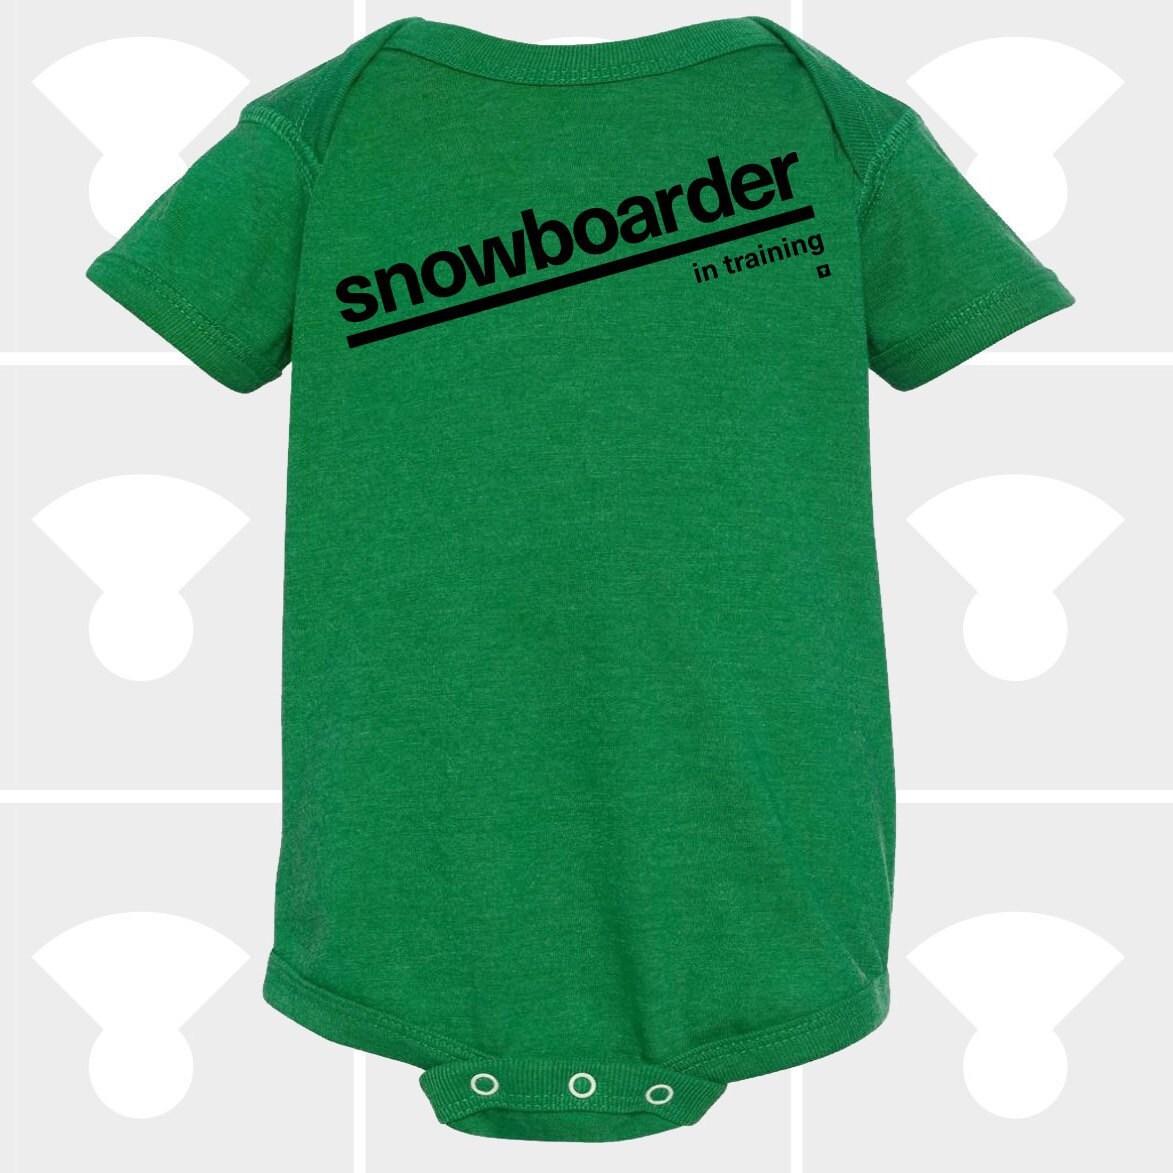 e74d4517d Baby Onesie Snowboarder In Training Funny Onesie Baby   Etsy